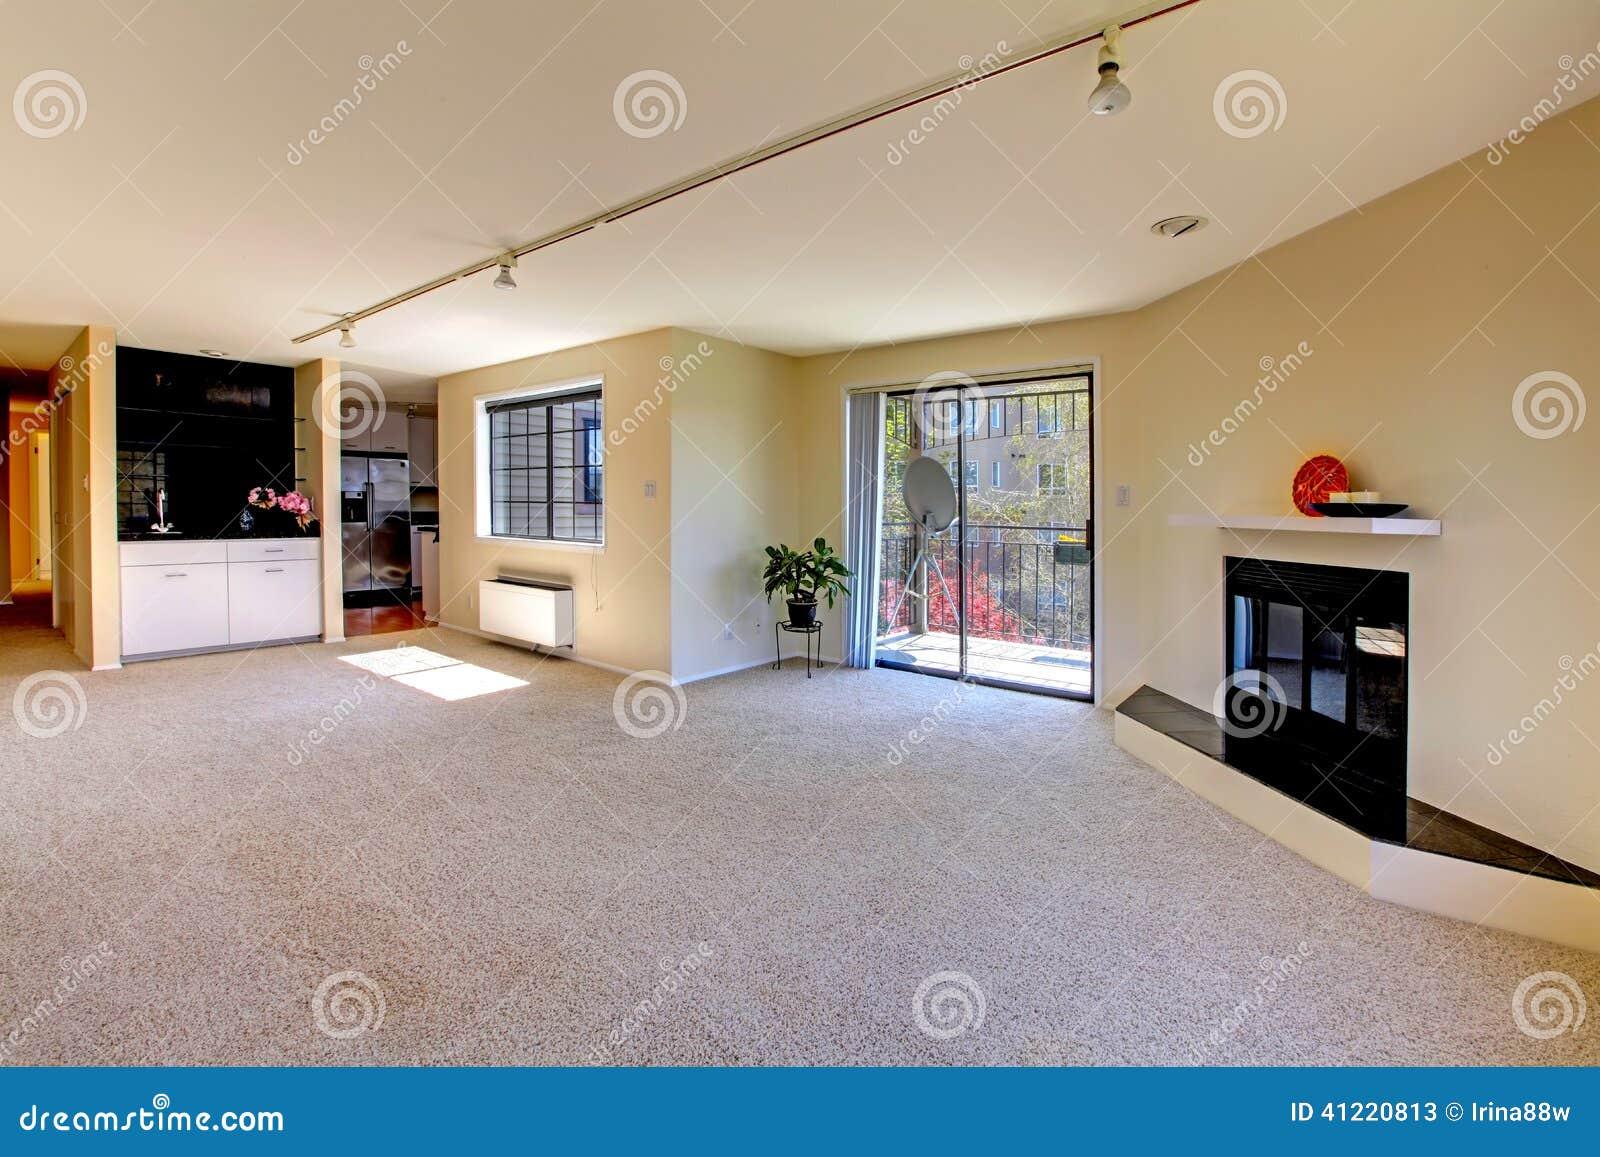 House Interior With Open Floor Plan Empty Room Stock